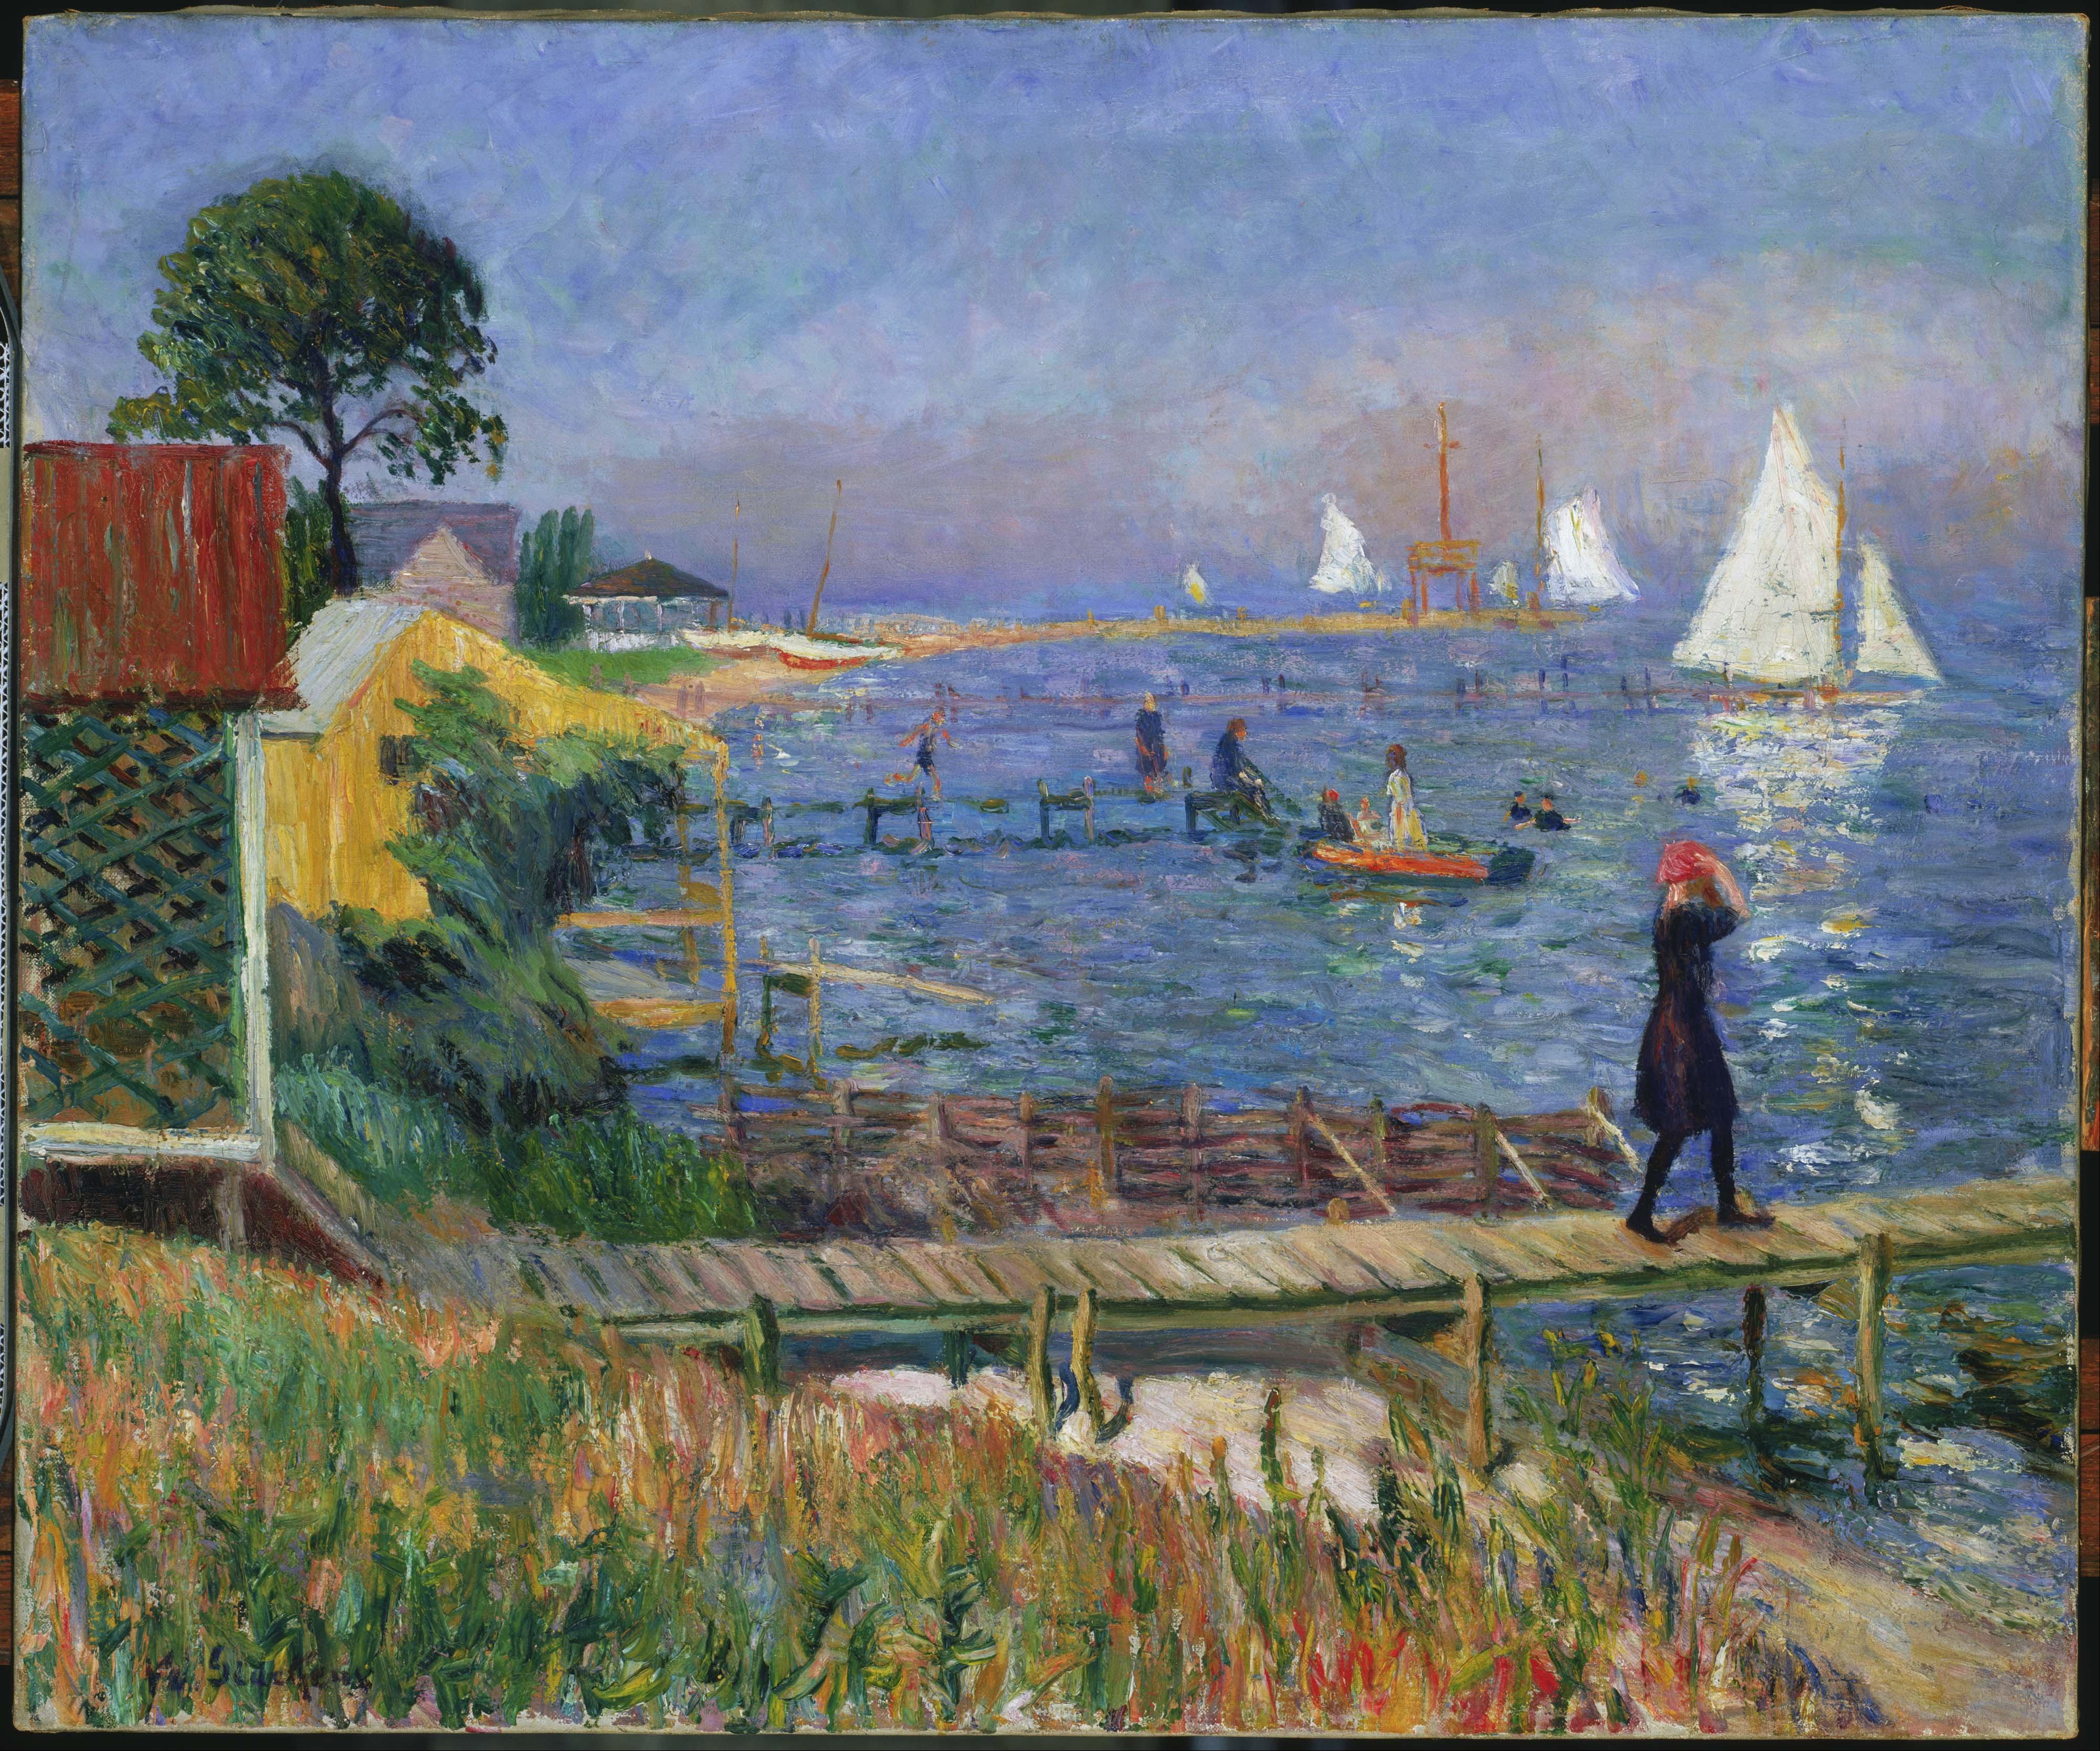 Art History News: William Glackens At The Barnes Foundation